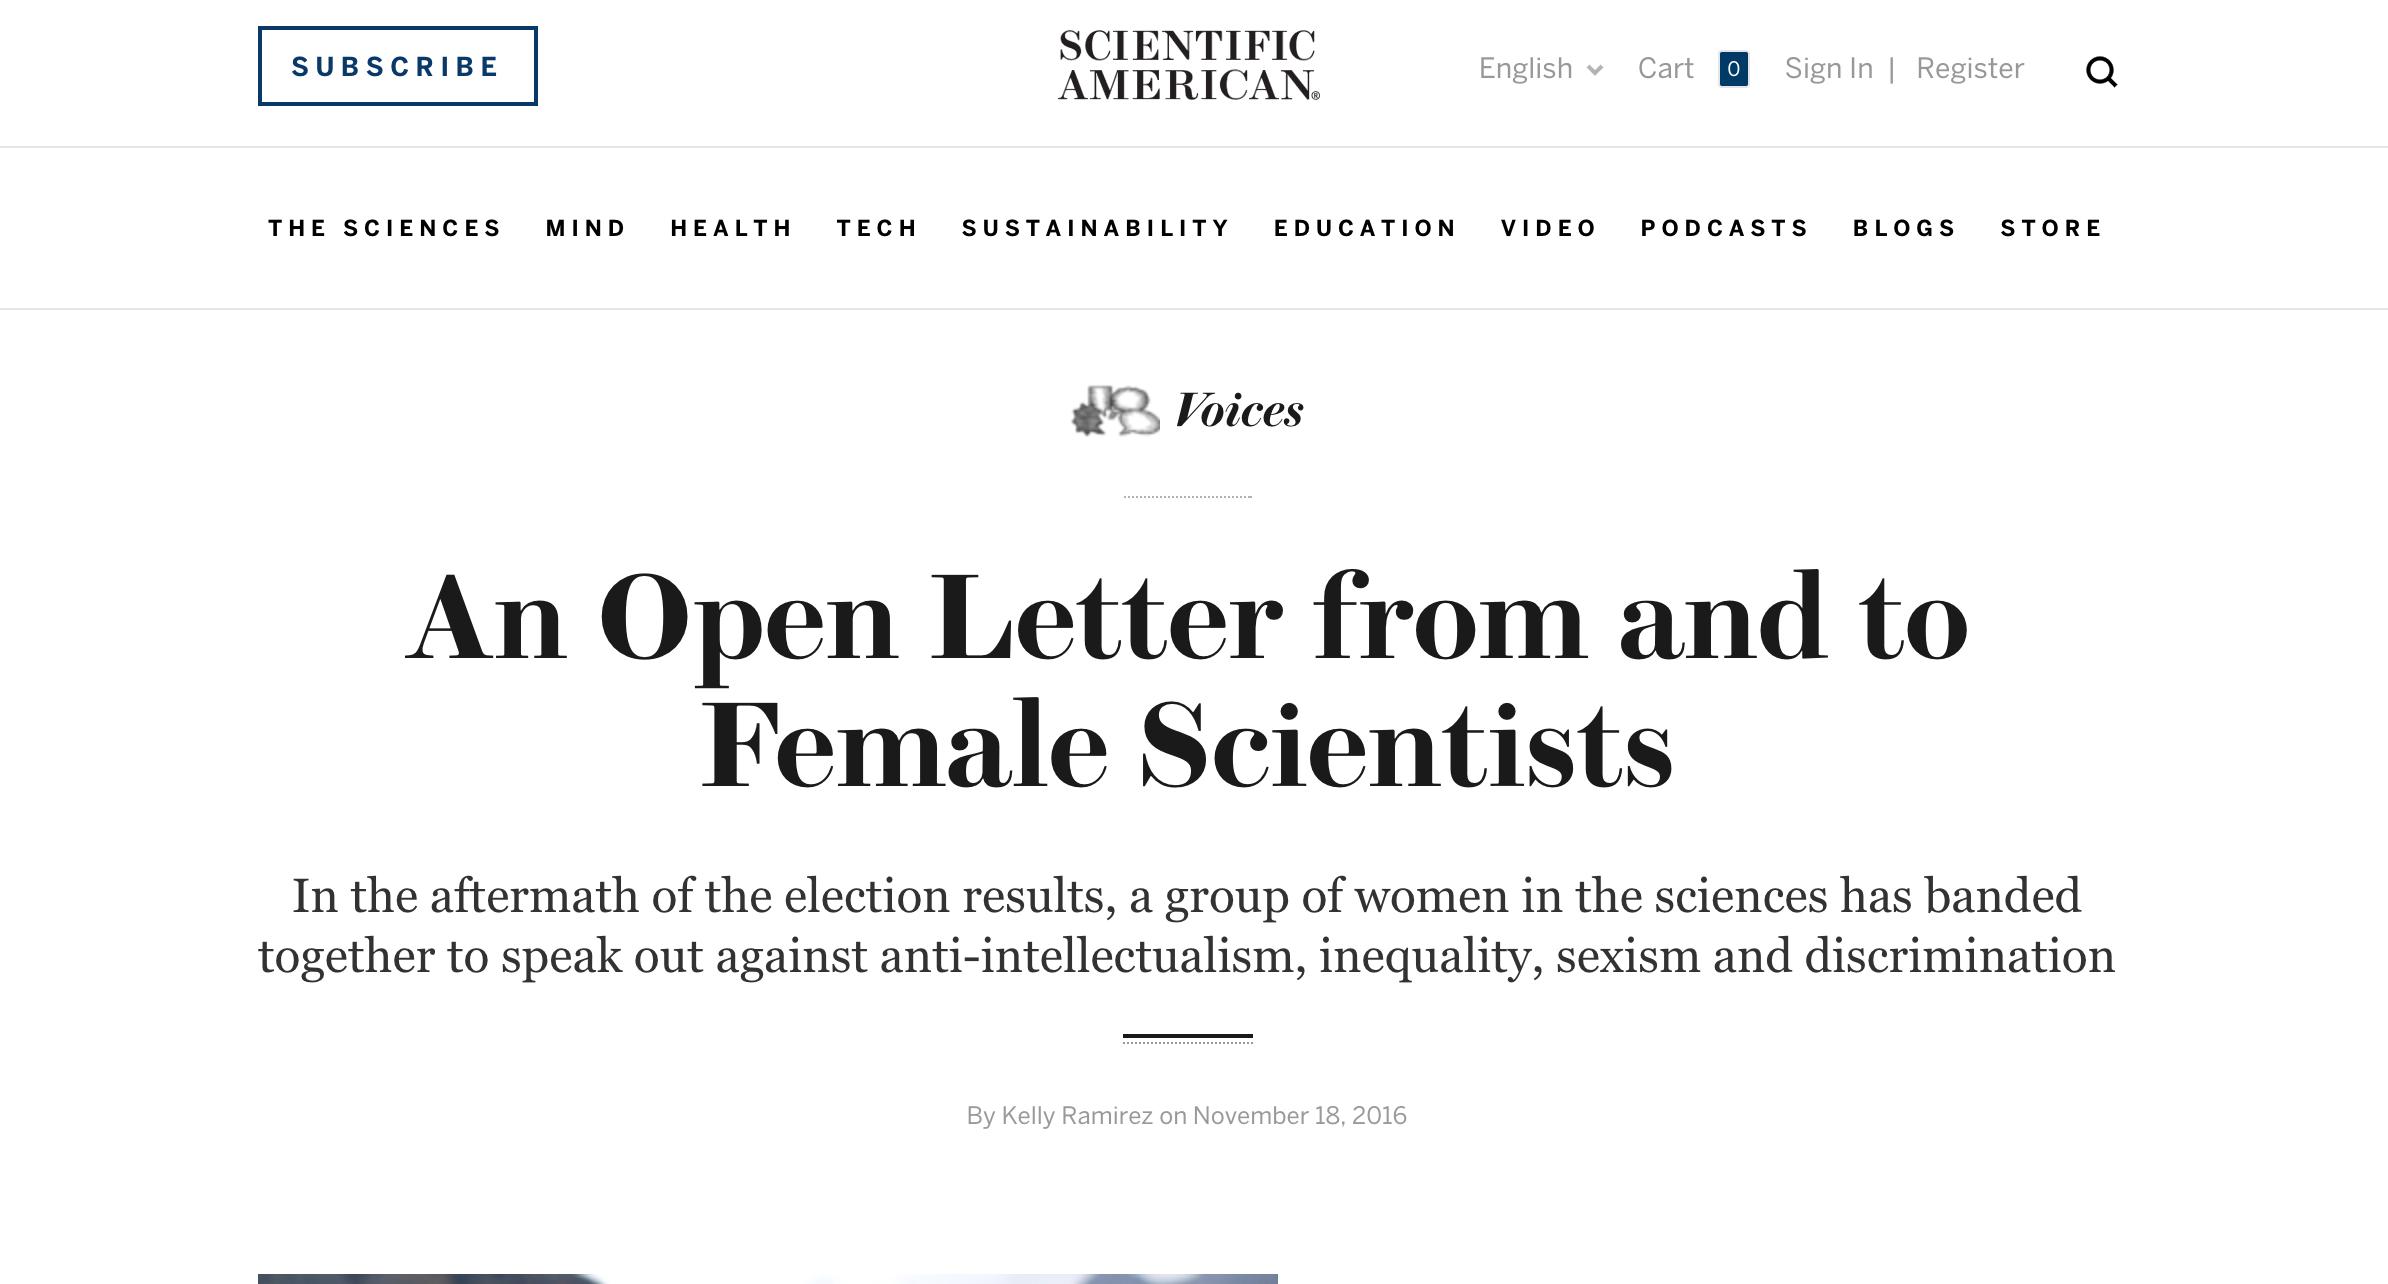 Scientific American, 18 November 2016